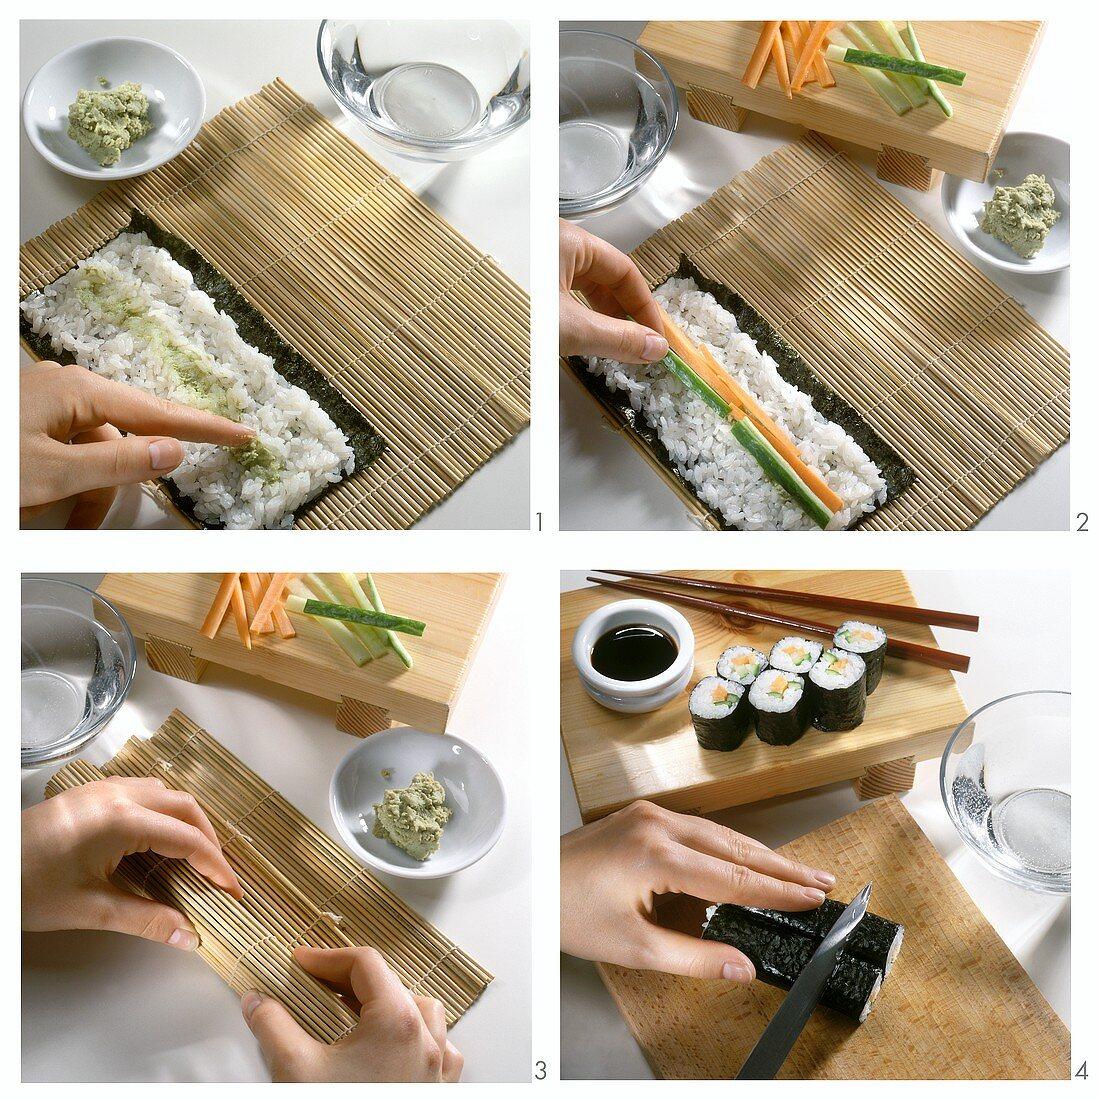 Preparing maki sushi